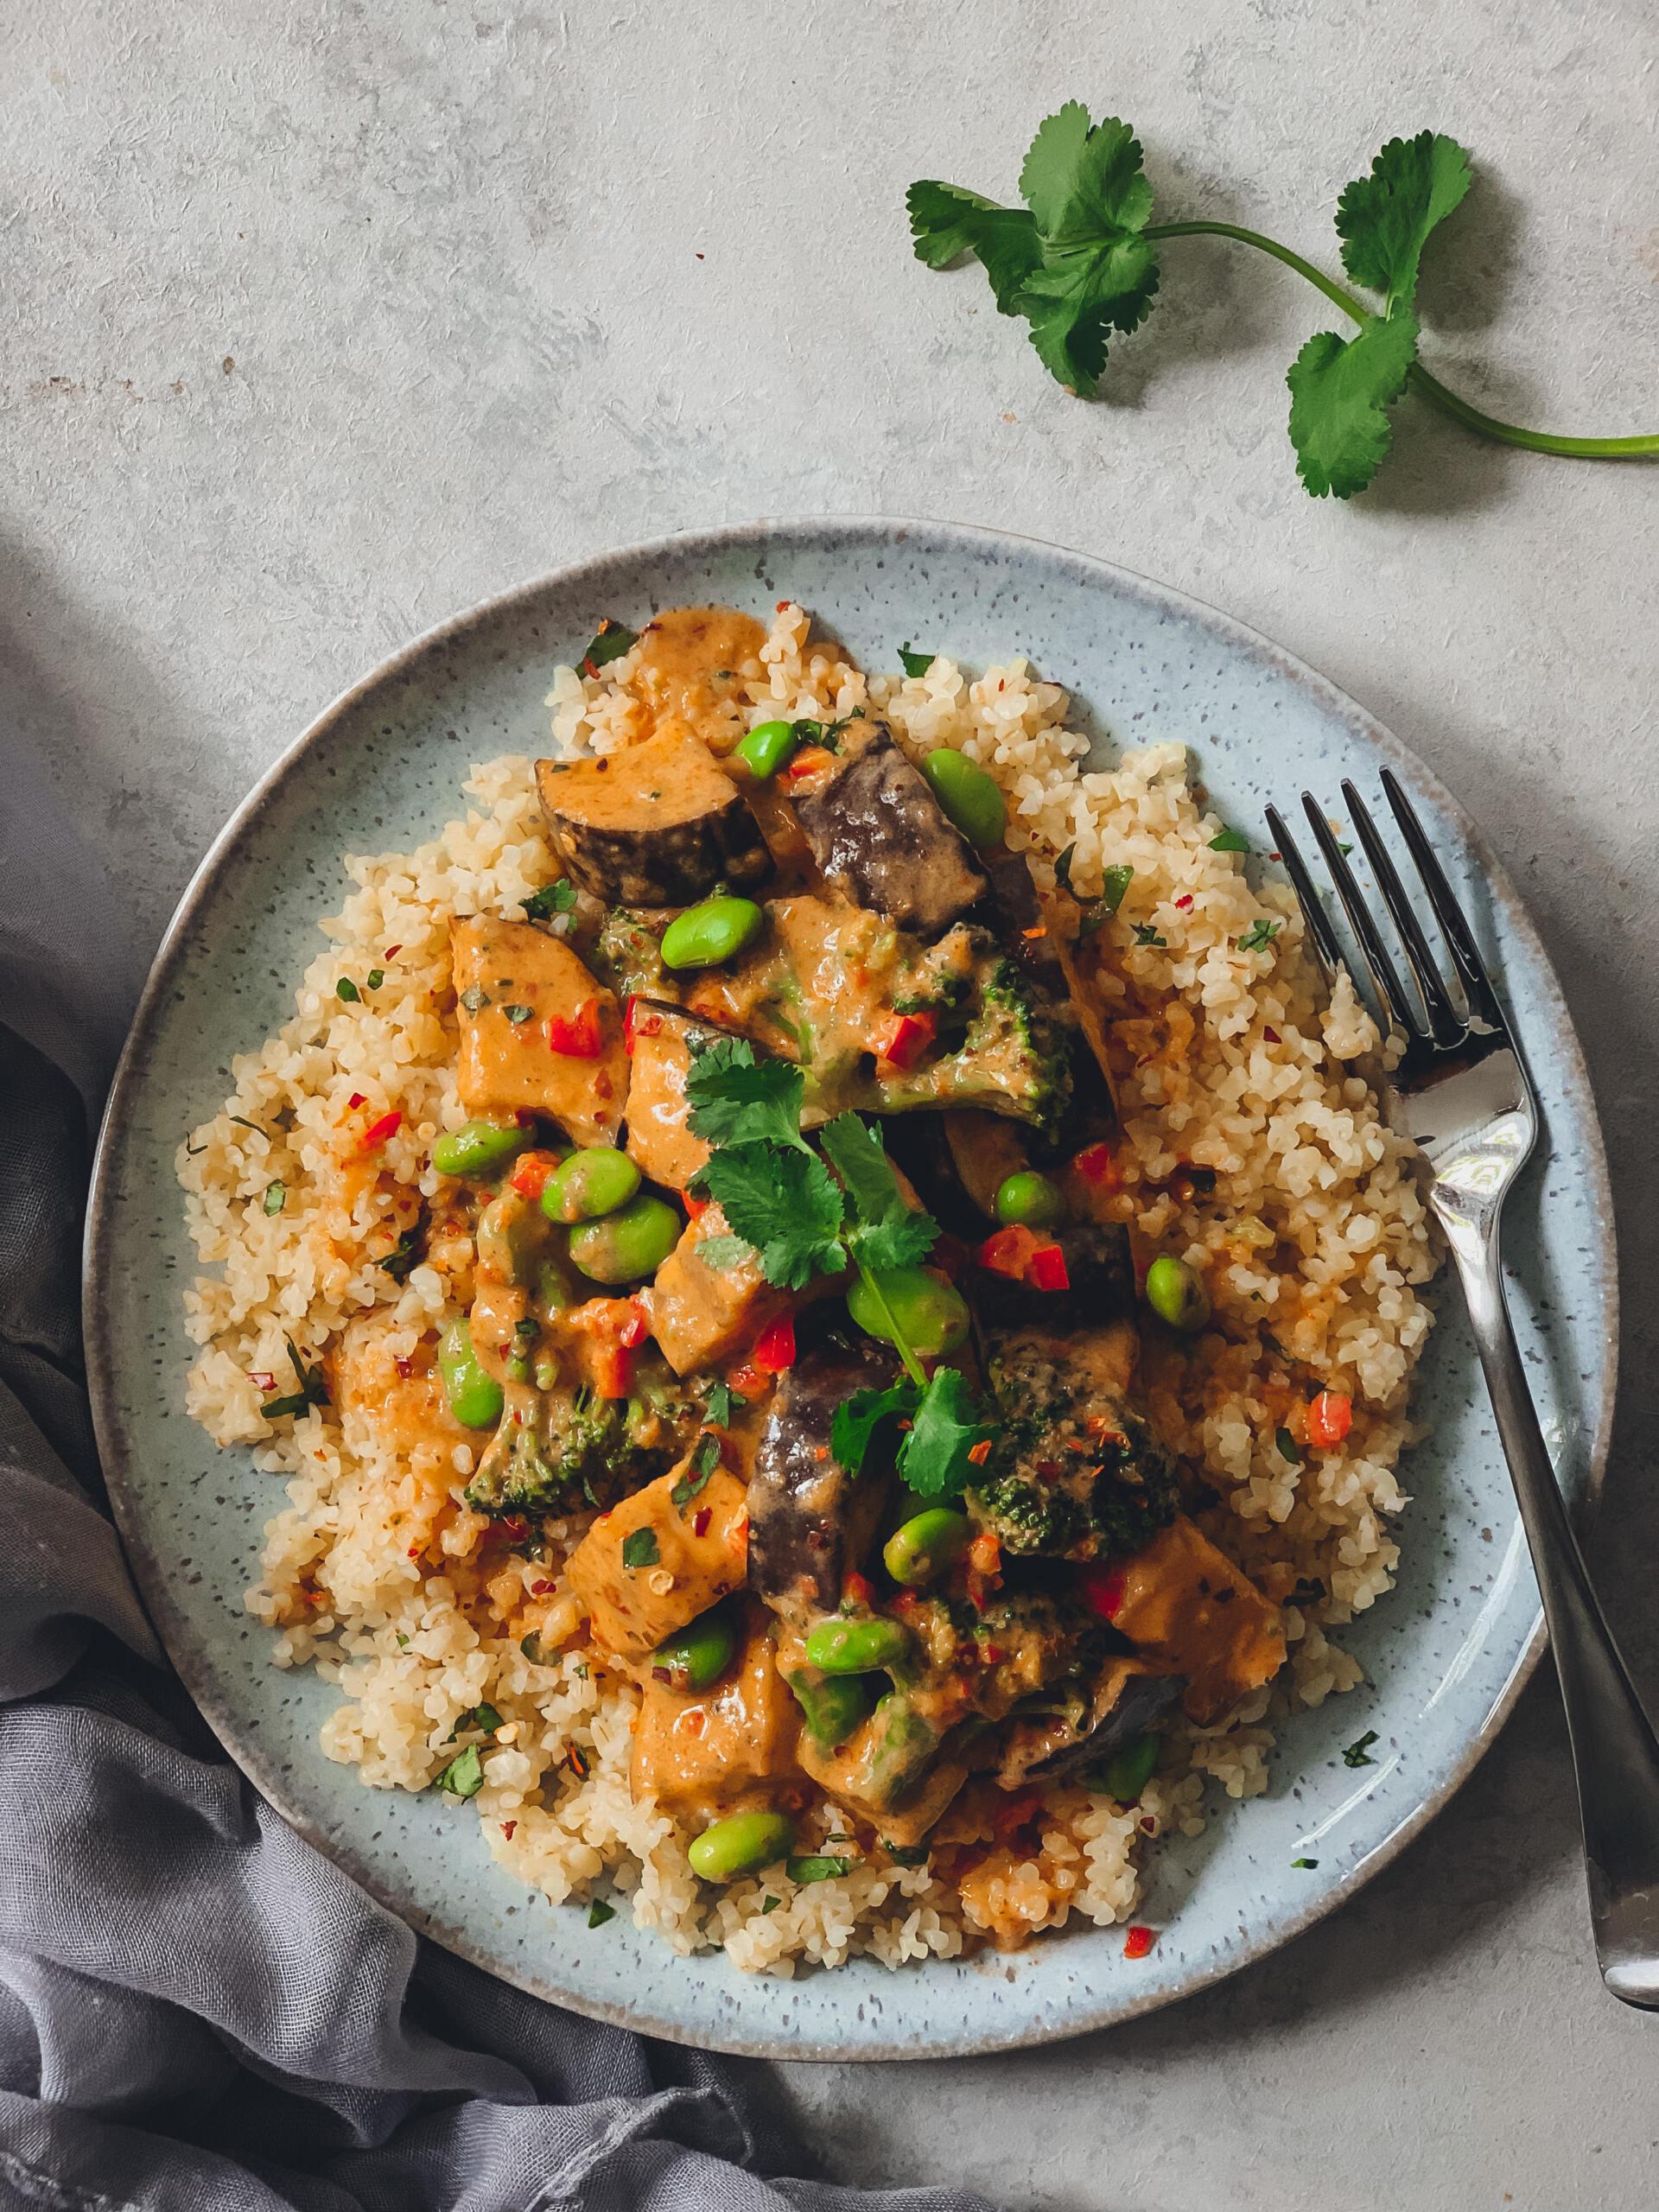 Aubergine and Broccoli Curry